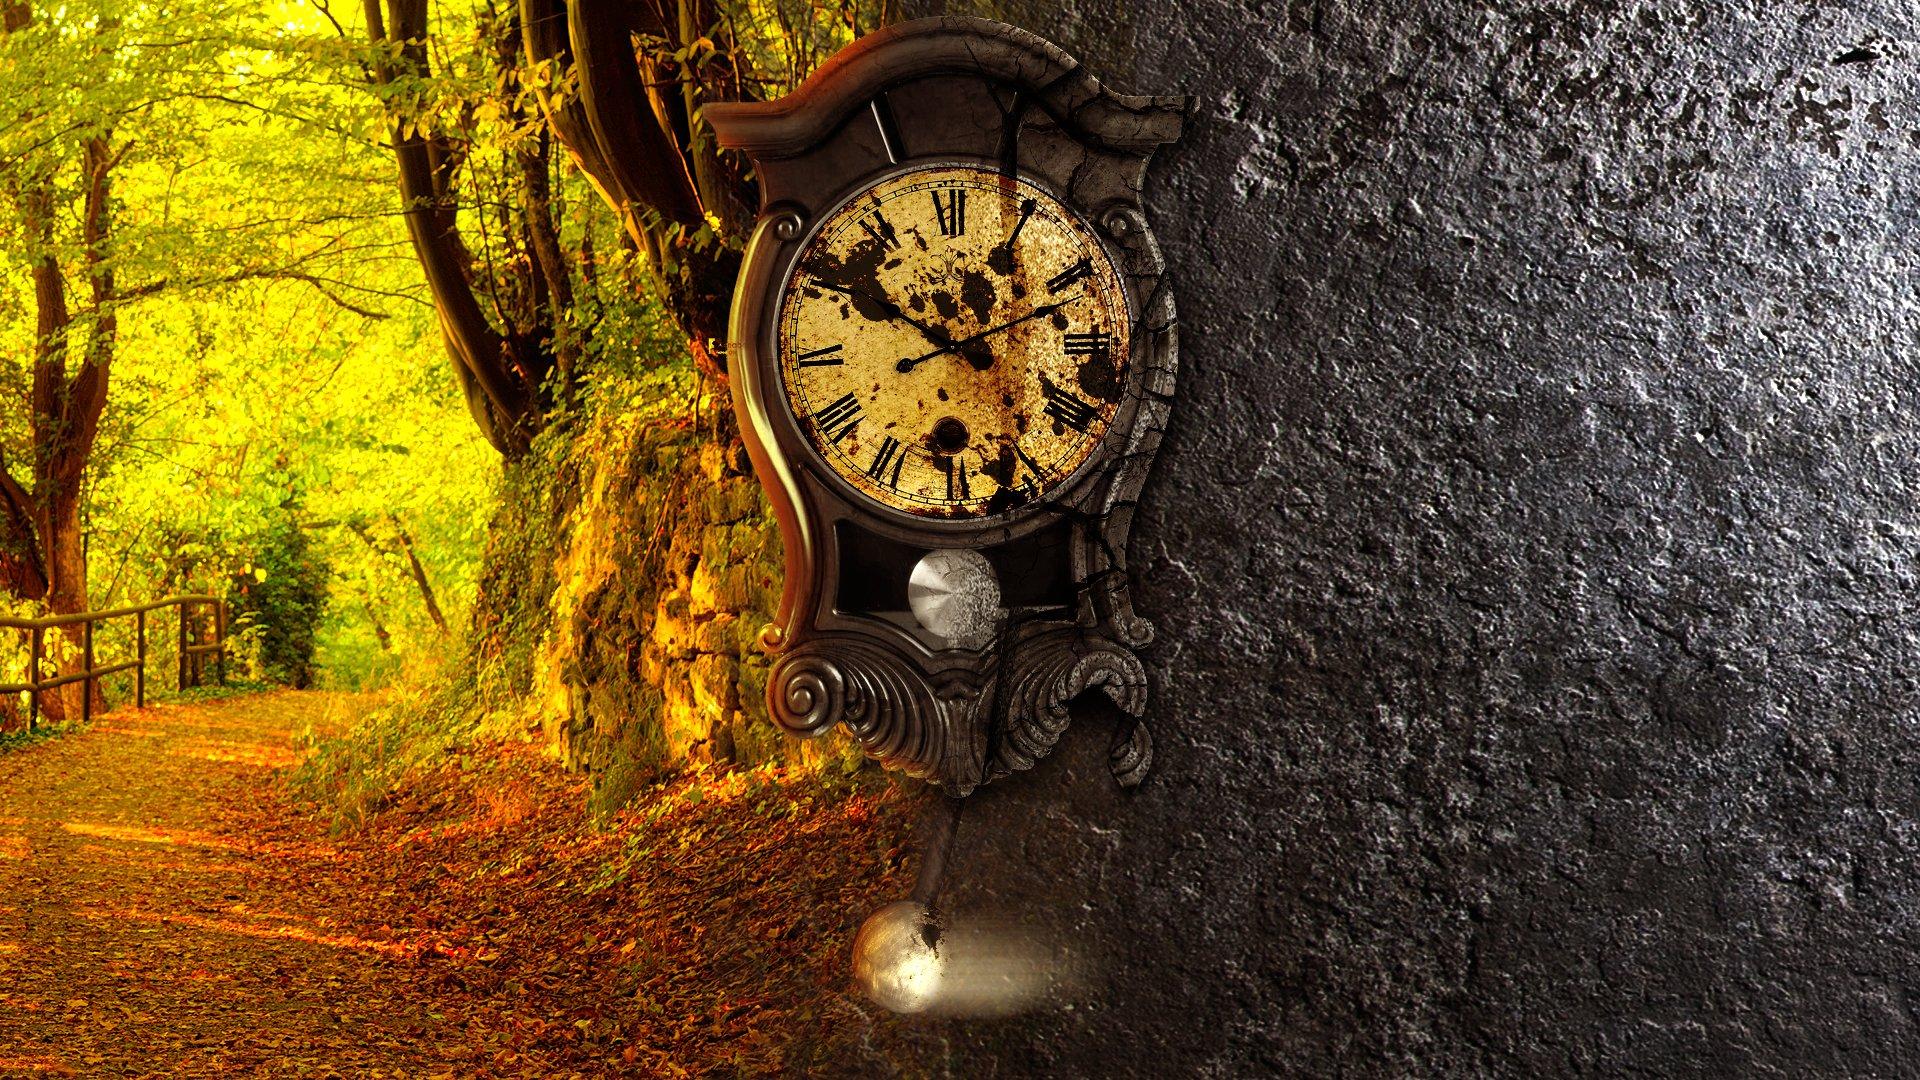 Clock Full HD Fond d'écran and Arrière-Plan | 1920x1080 | ID:431343